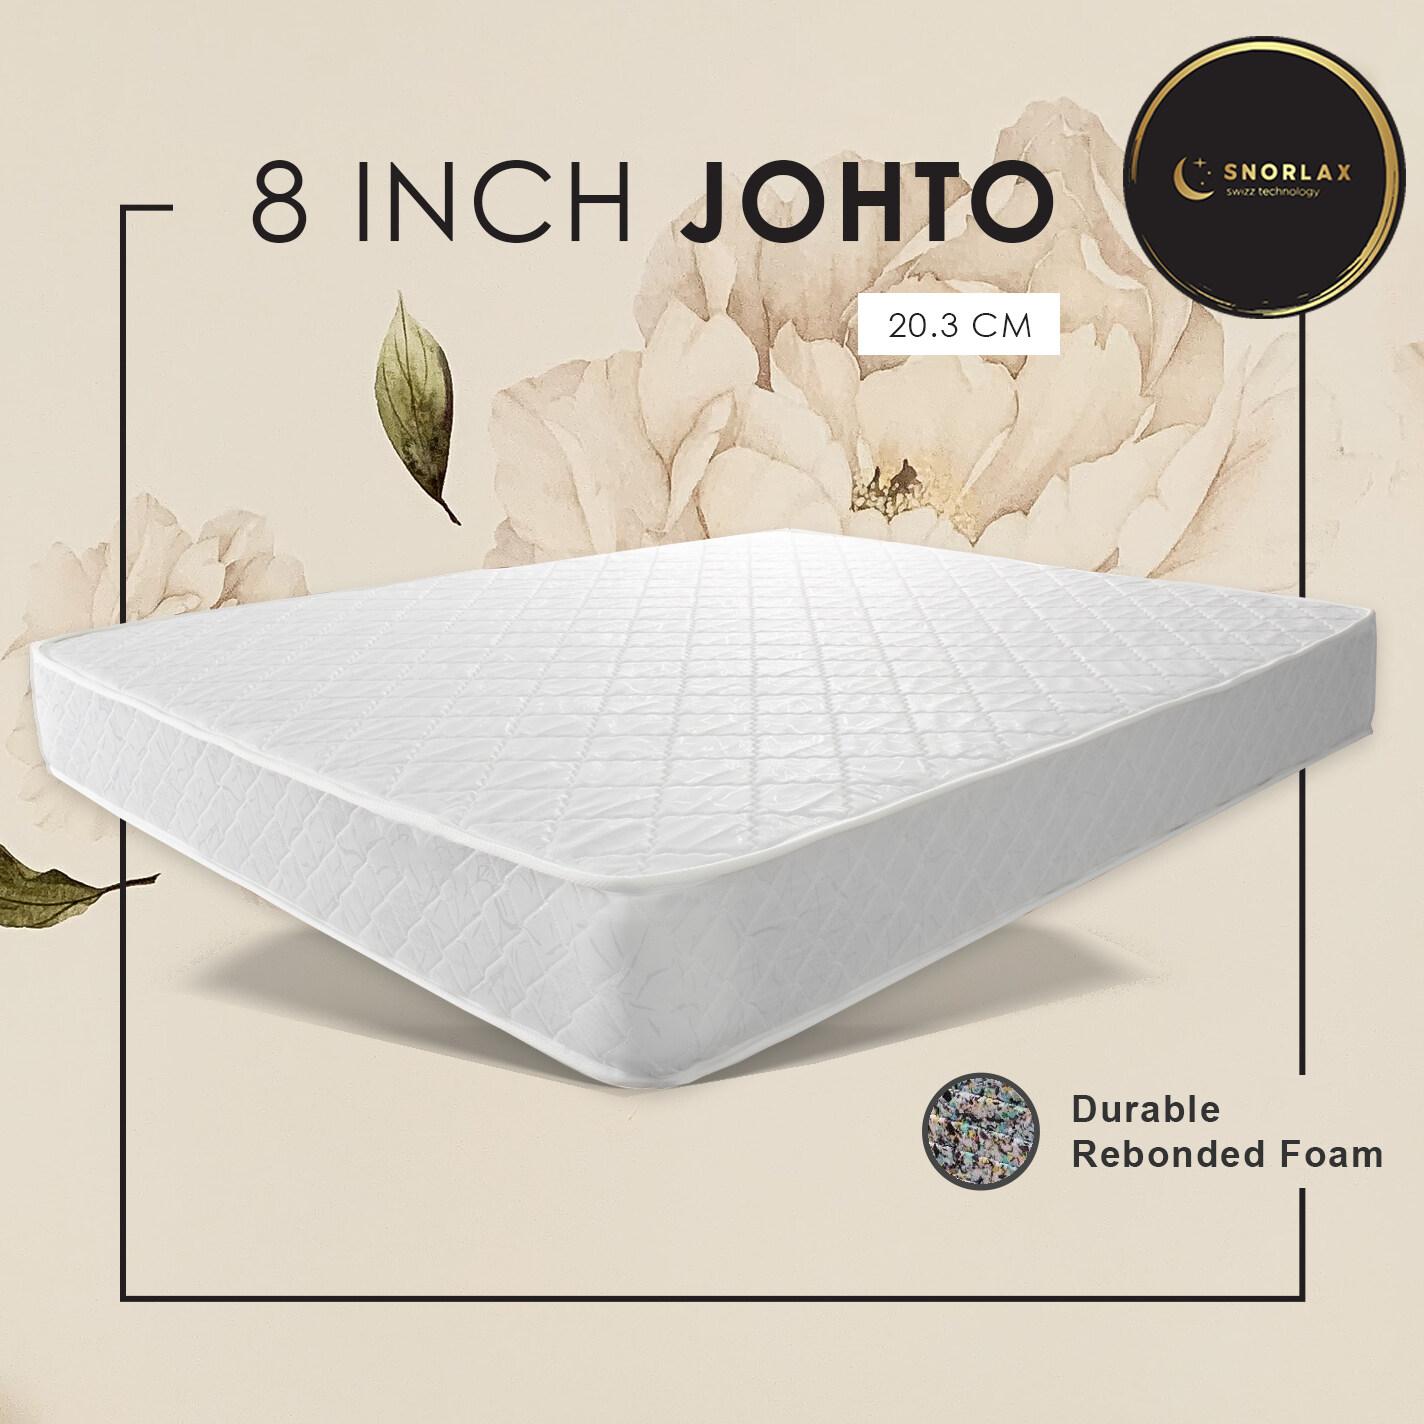 Snorlax Johto (Single) (Queen) Rebond Foam Mattress (3' x 8'') (5' x 8'') *Random Fabric Design*